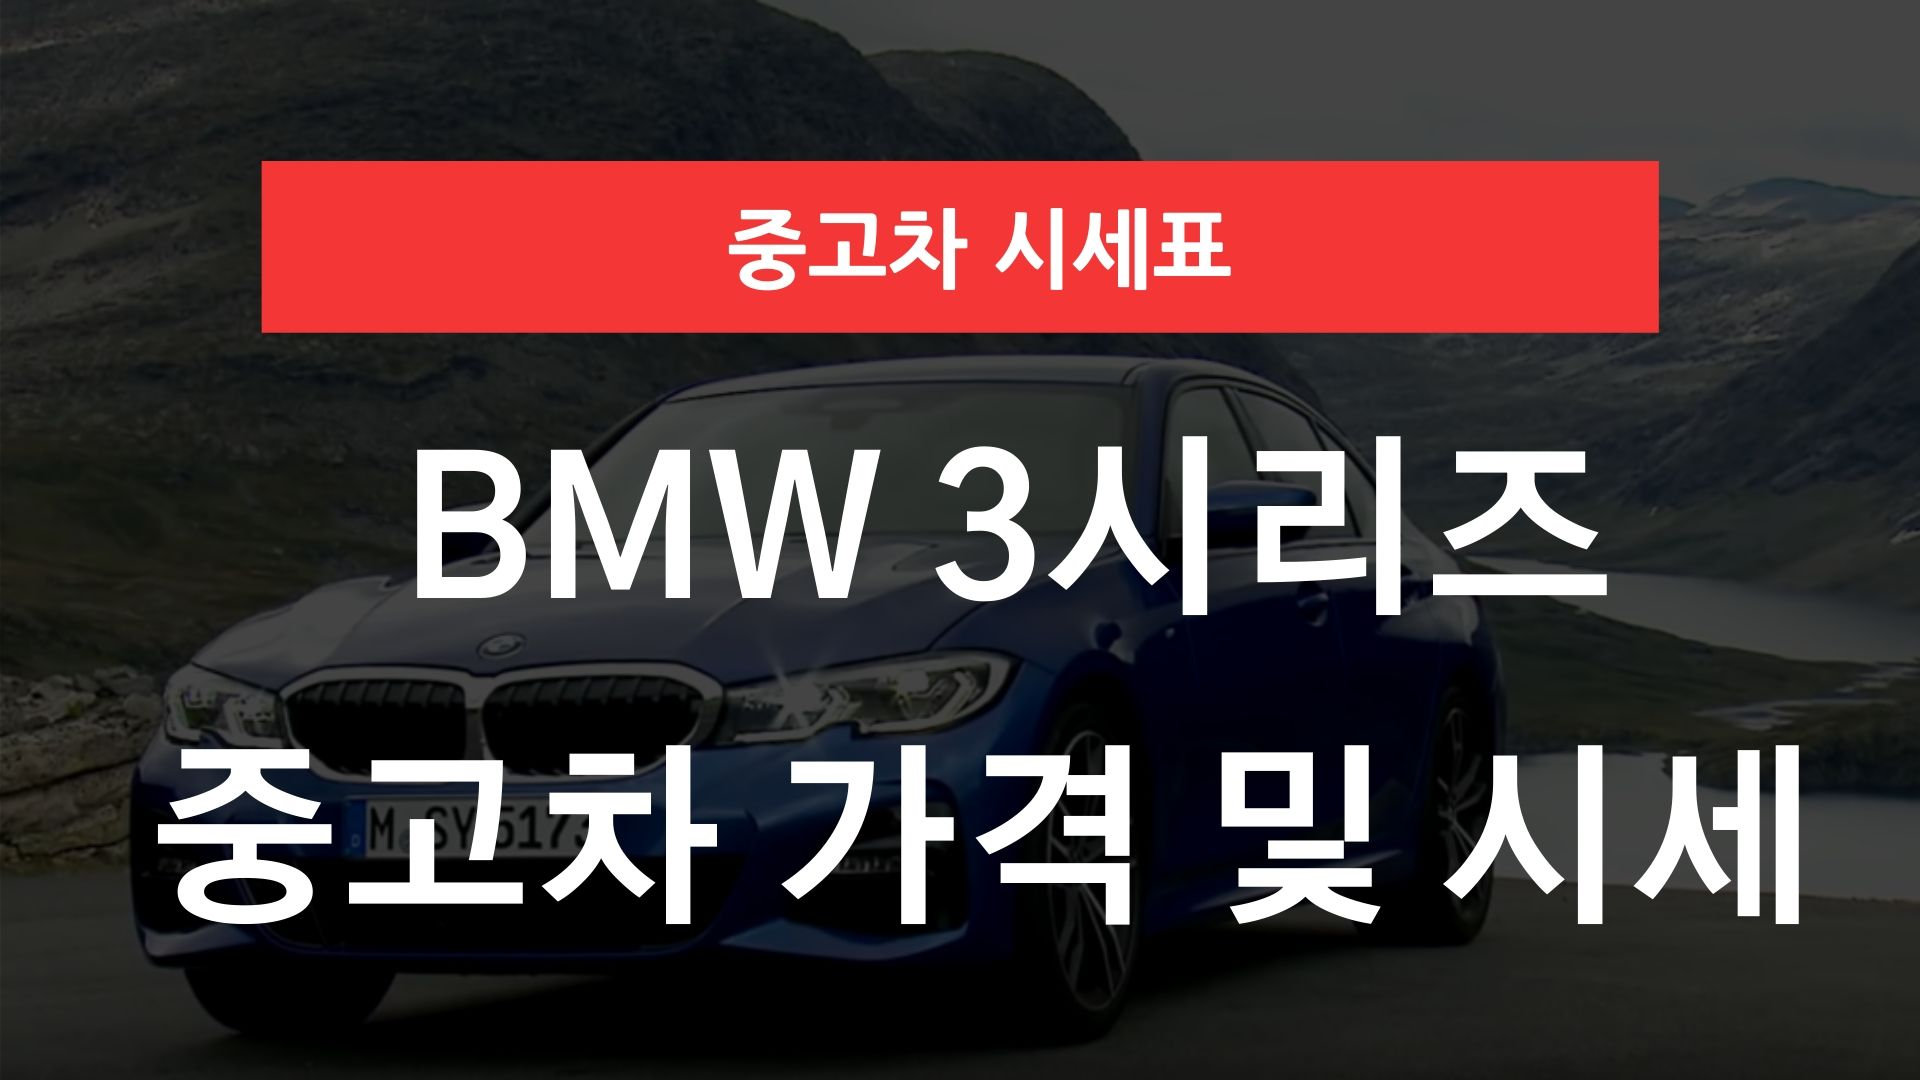 BMW 3시리즈 중고차 가격